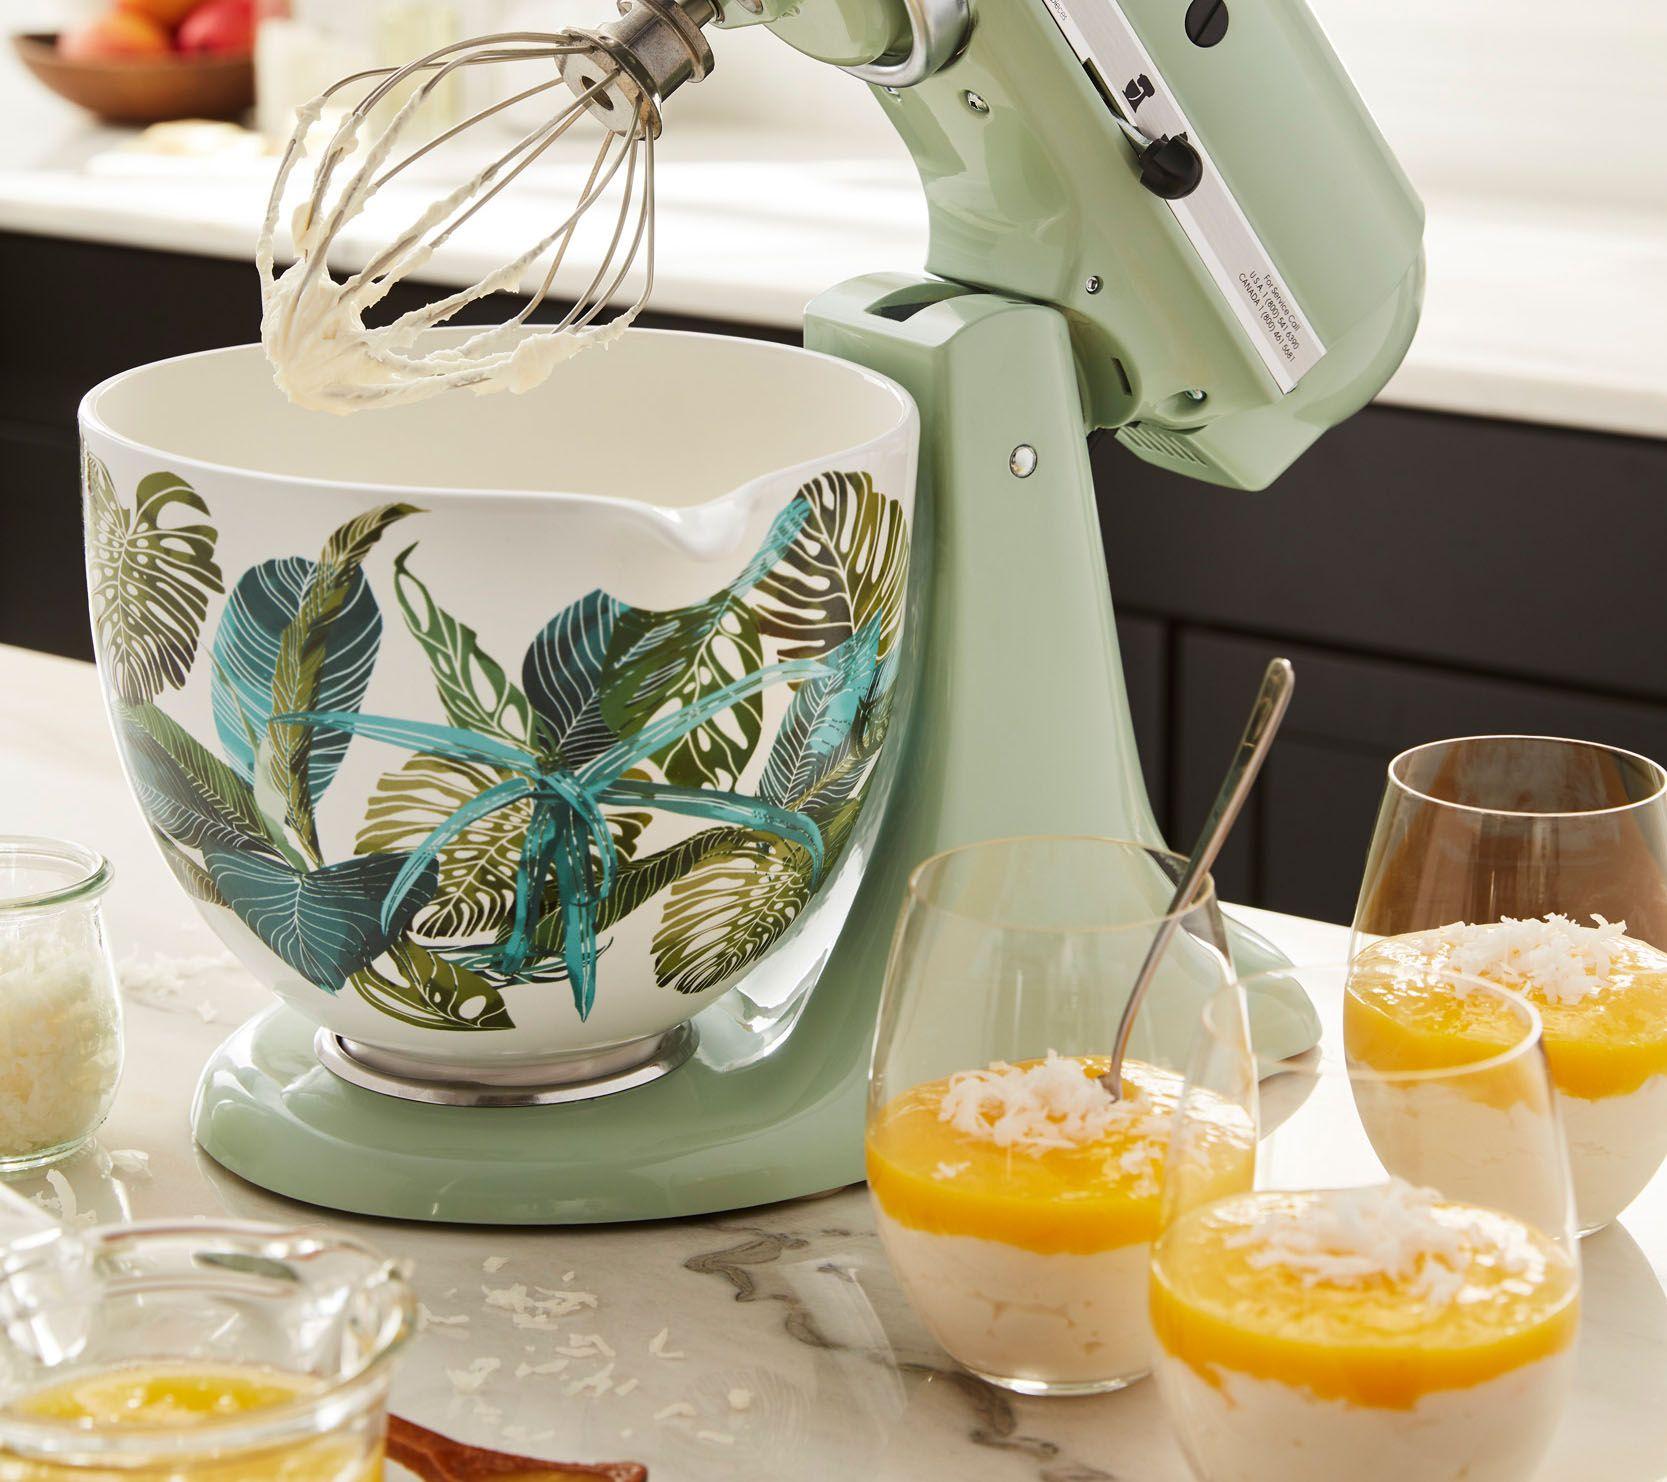 kitchen aid bowls wall art for kitchenaid 5 quart ceramic patterned bowl tropical floral page 1 qvc com